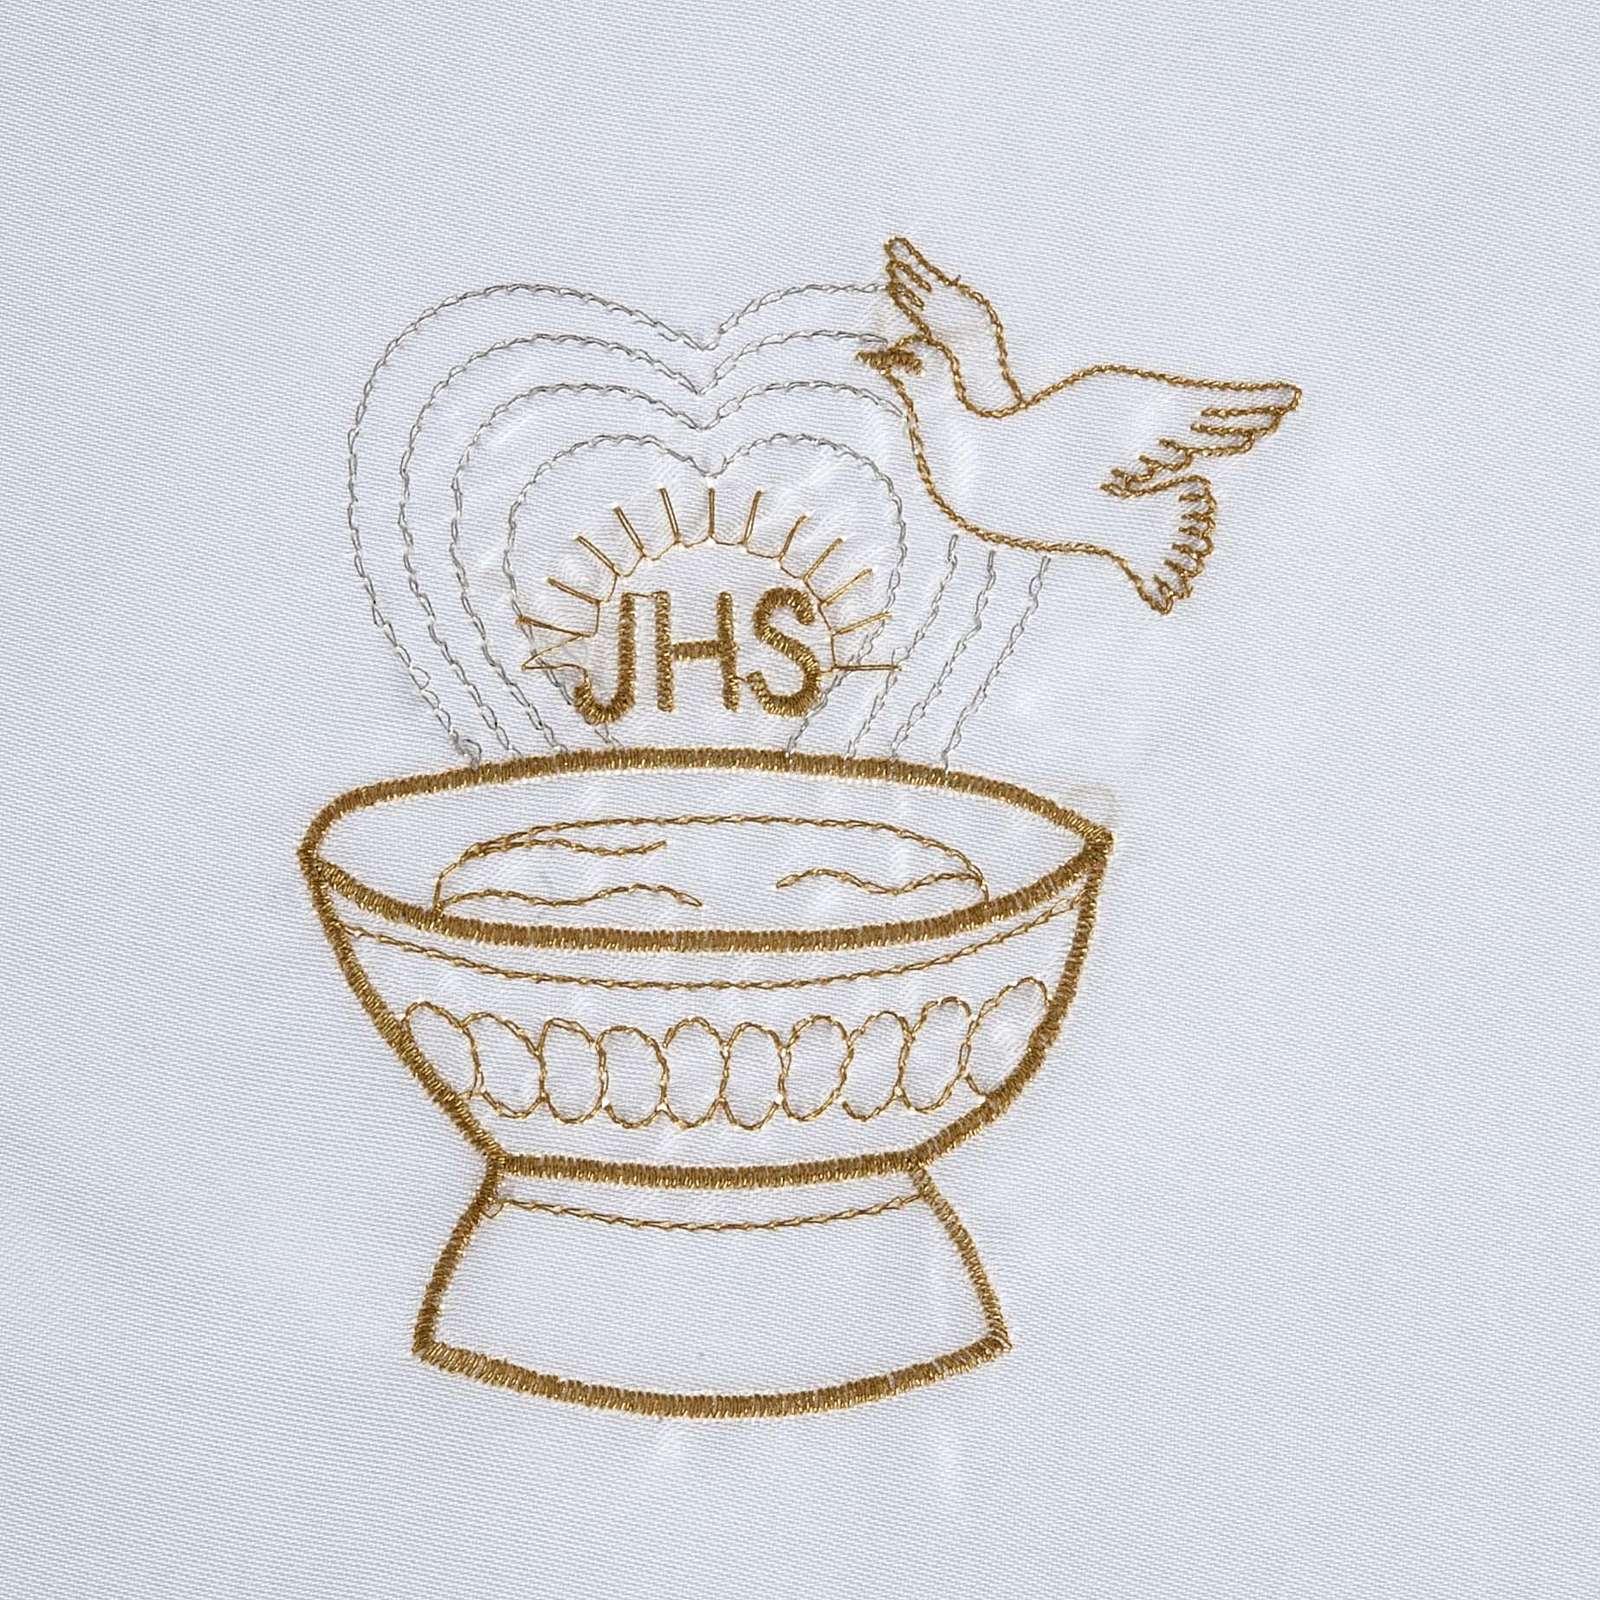 Vestina battesimo raso colomba IHS fonte battesimale 4